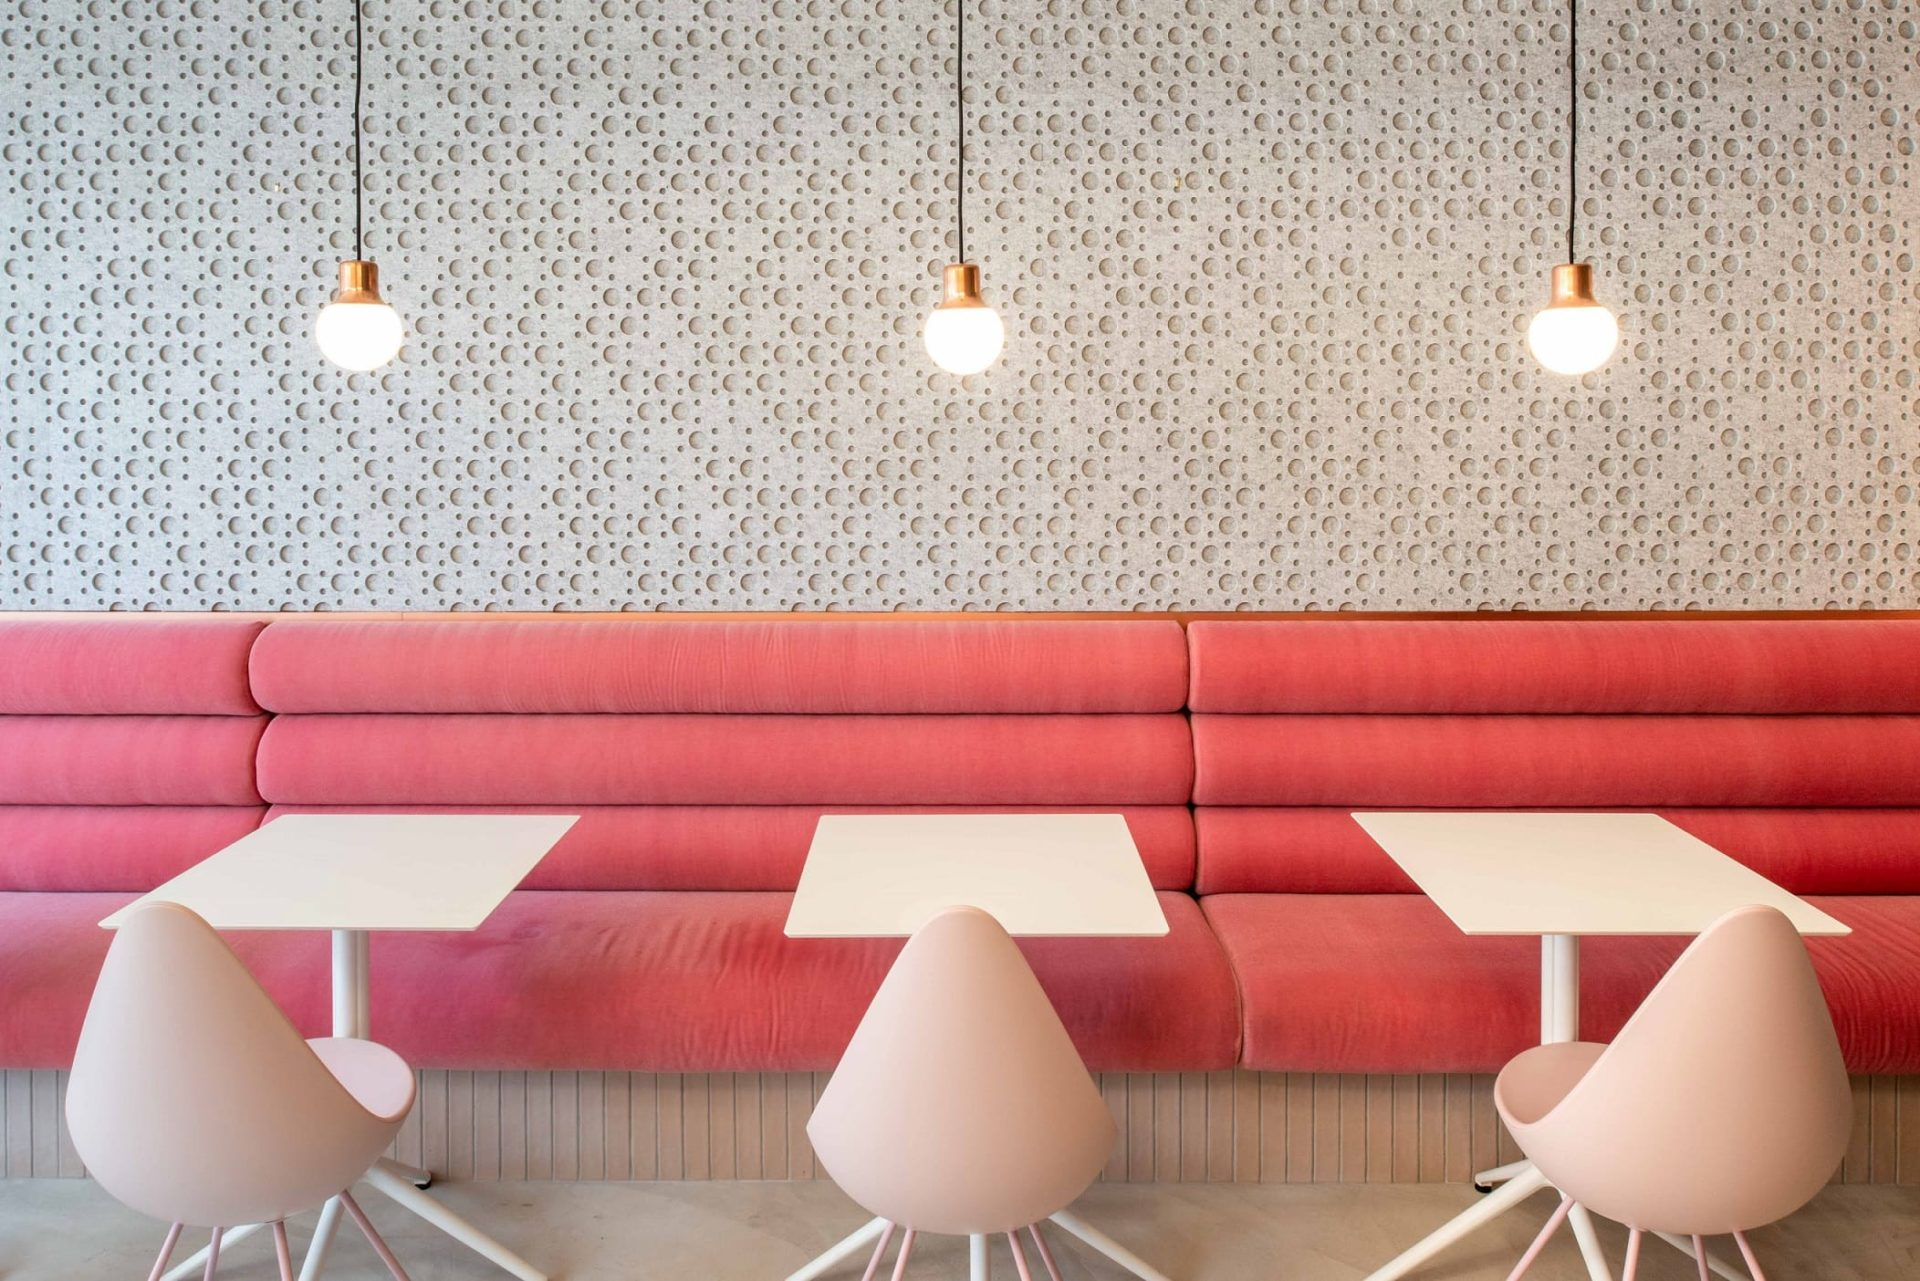 KOVA South Kensington interior with PET felt panels